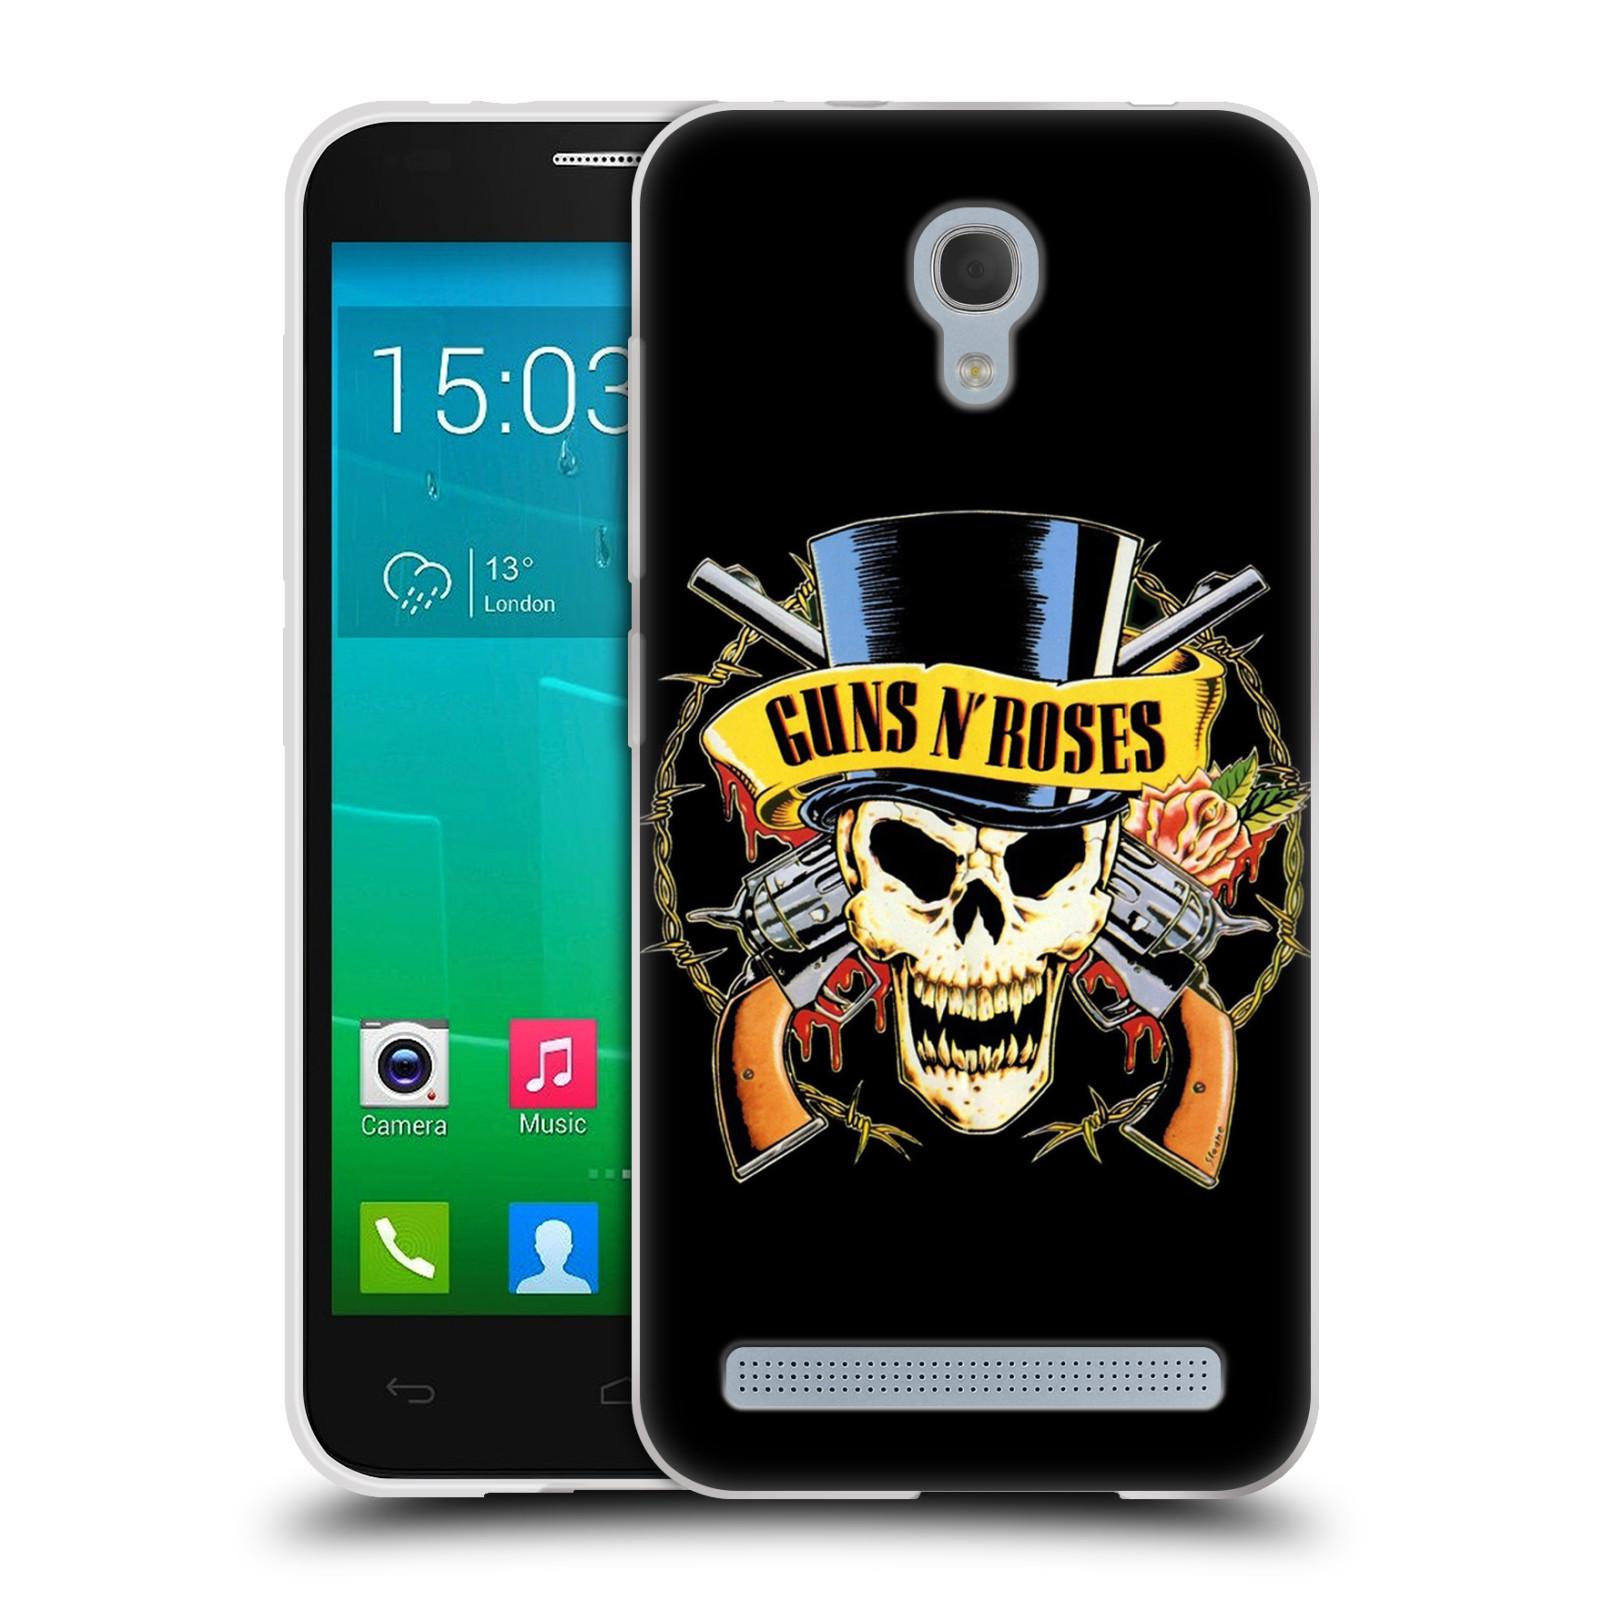 Silikonové pouzdro na mobil Alcatel One Touch Idol 2 Mini S 6036Y HEAD CASE Guns N' Roses - Lebka (Silikonový kryt či obal na mobilní telefon licencovaným motivem Guns N' Roses pro Alcatel Idol 2 Mini S OT-6036Y)